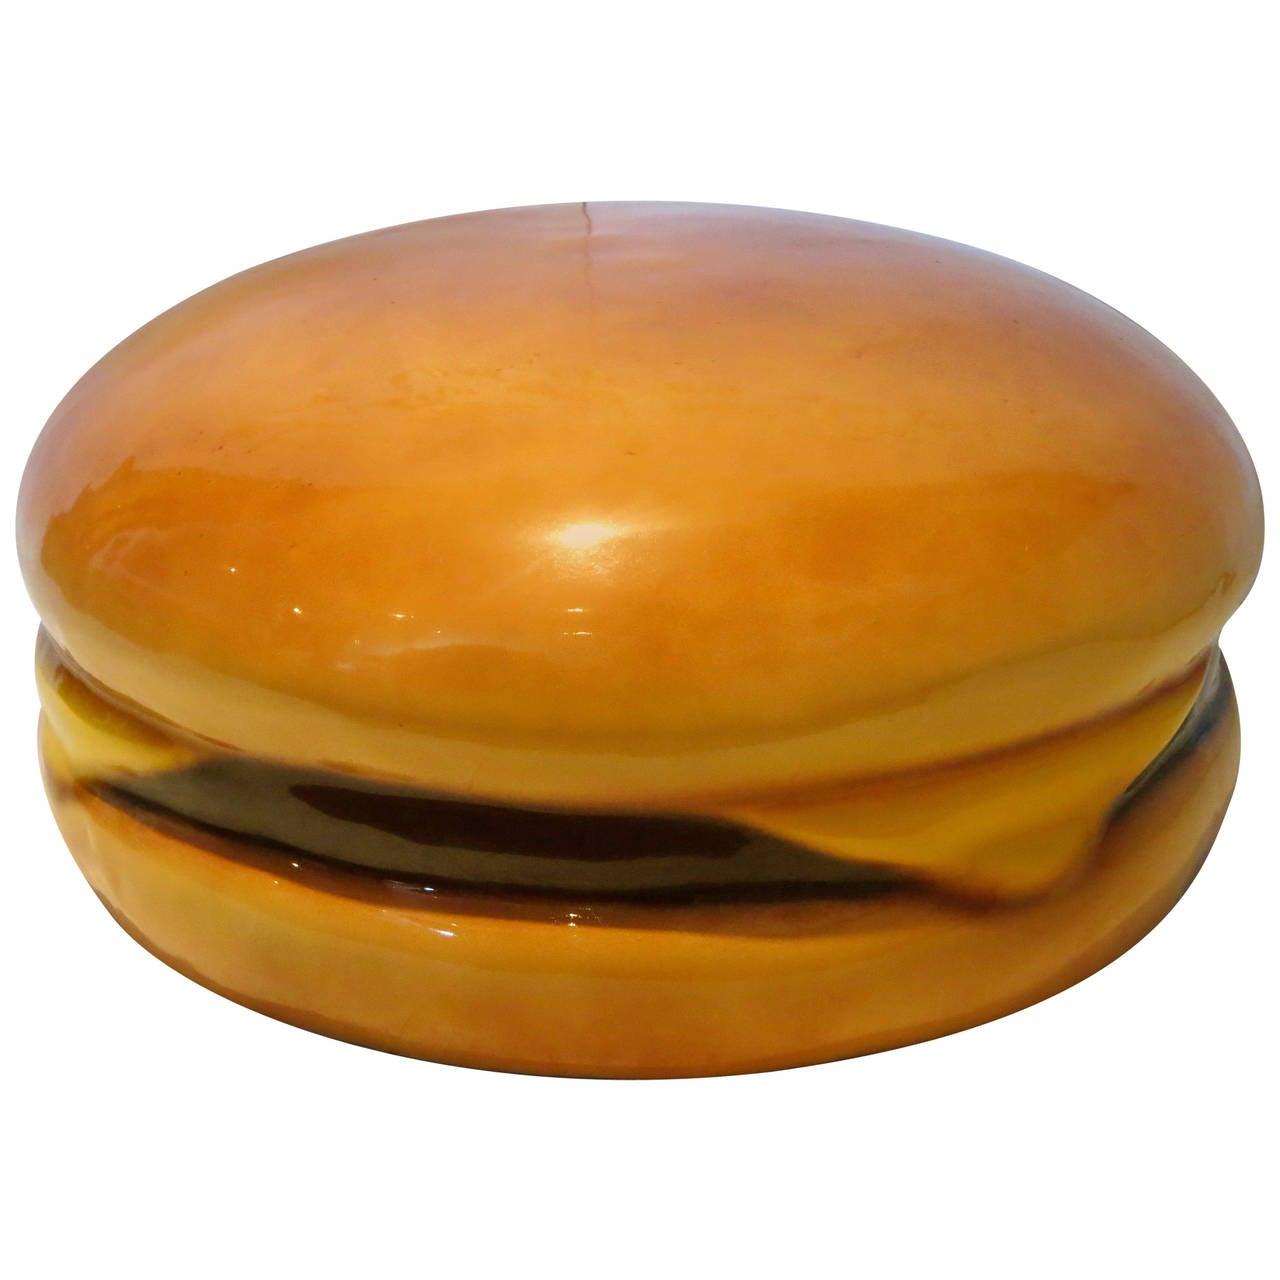 Giant Cheeseburger Molded Foam Fake Food Prop Display Pop